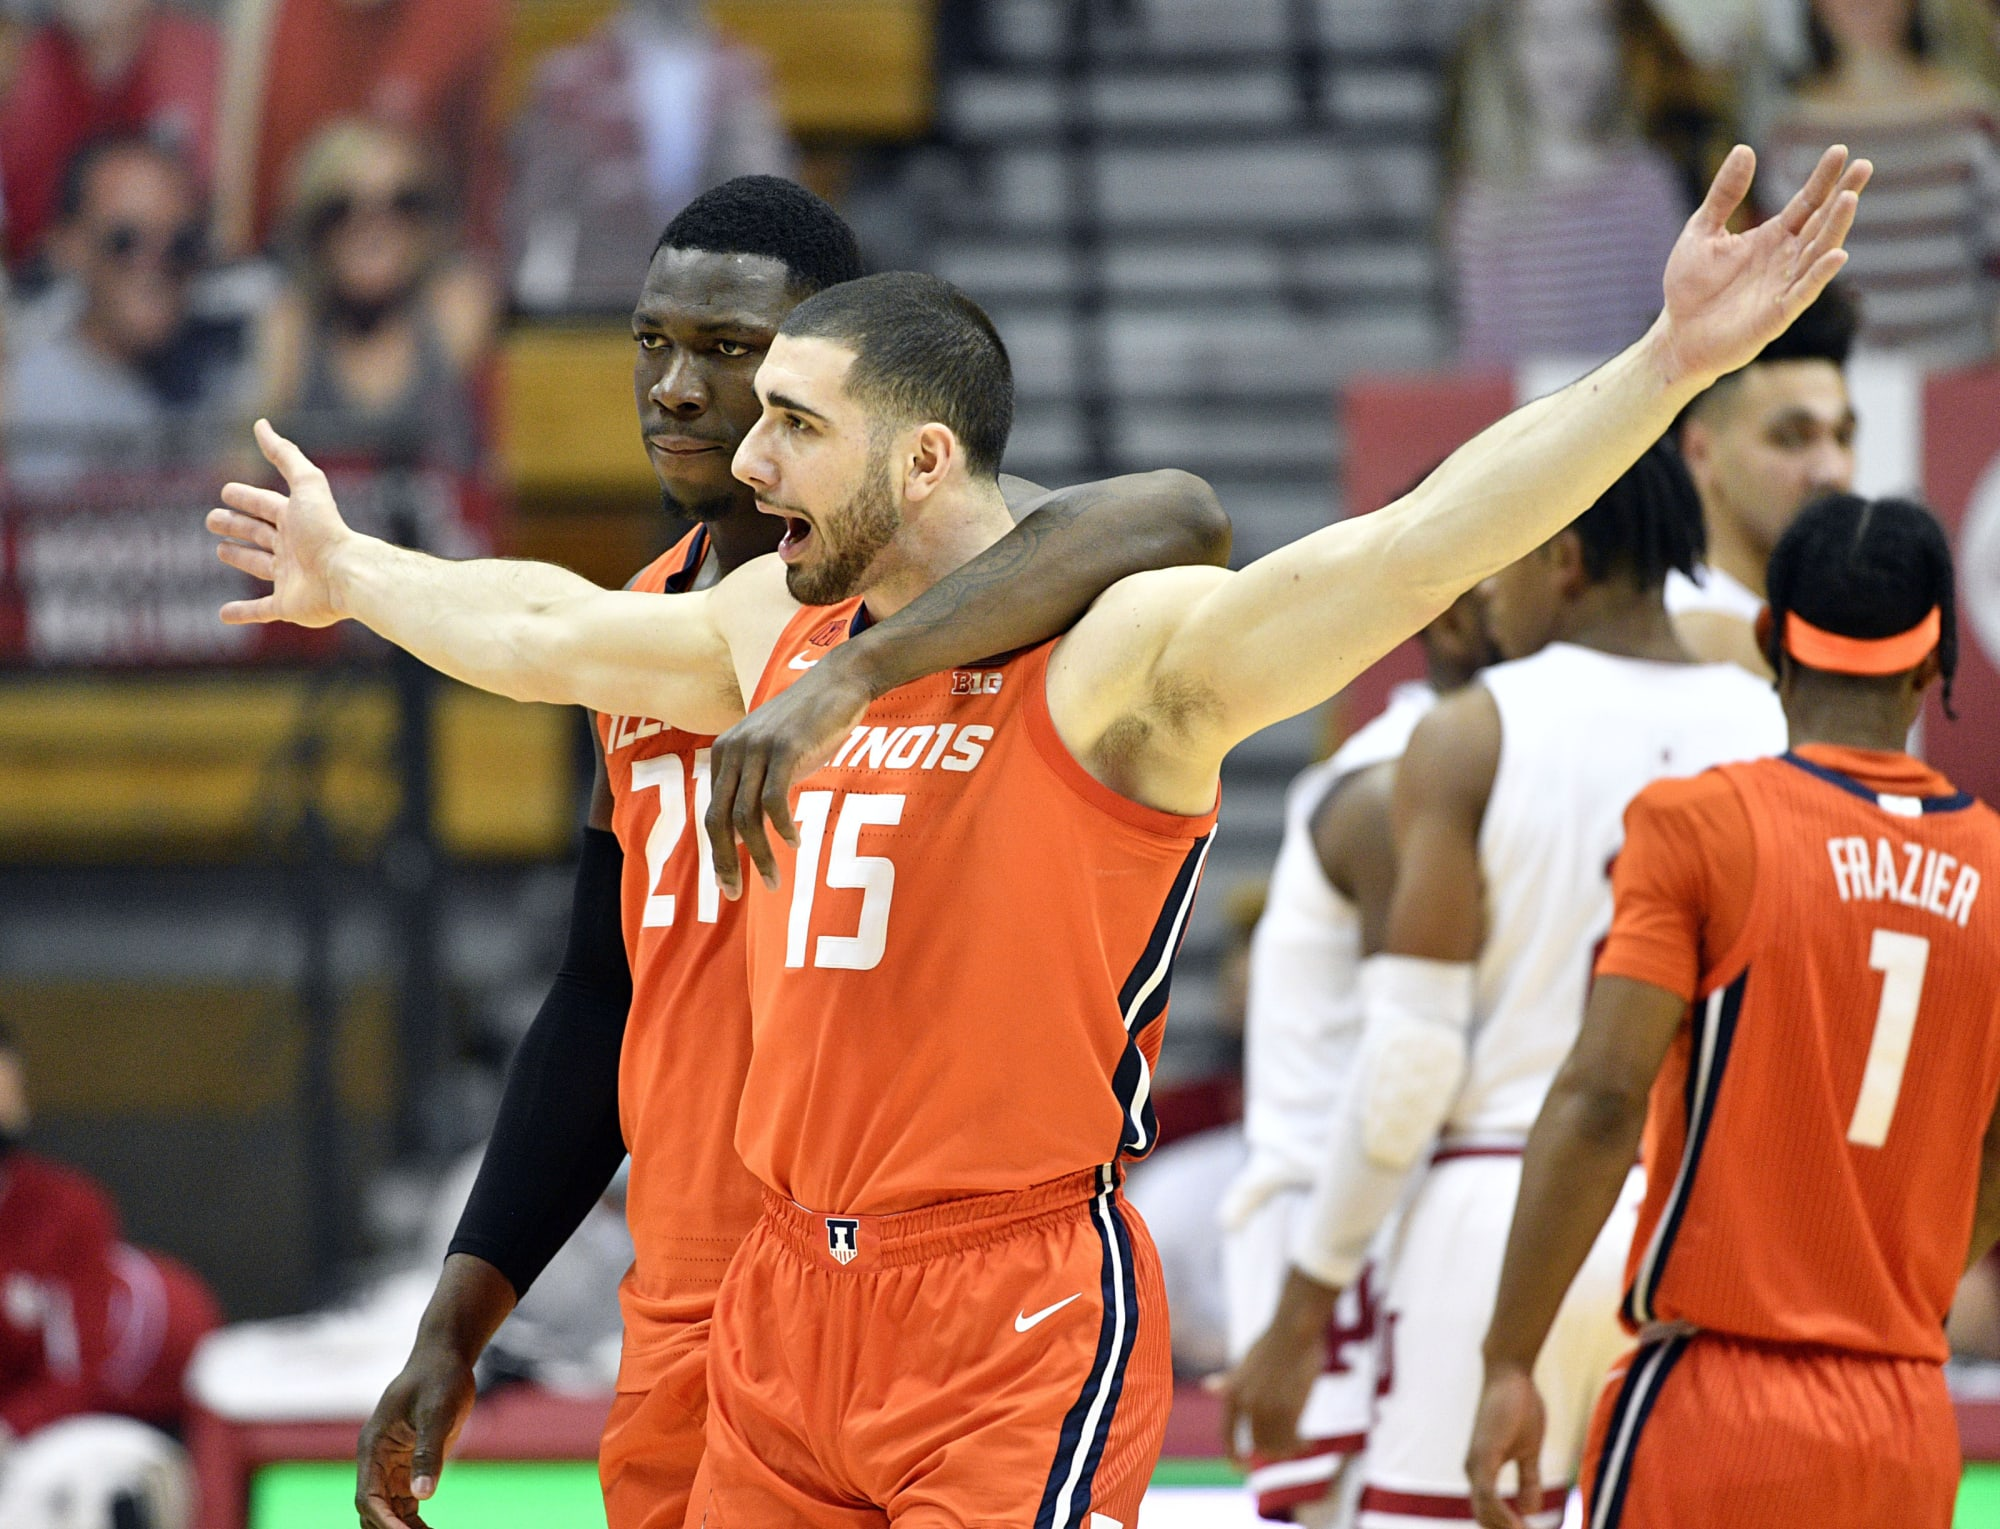 Illinois Basketball: New AP Top 25 has Illini in top 10